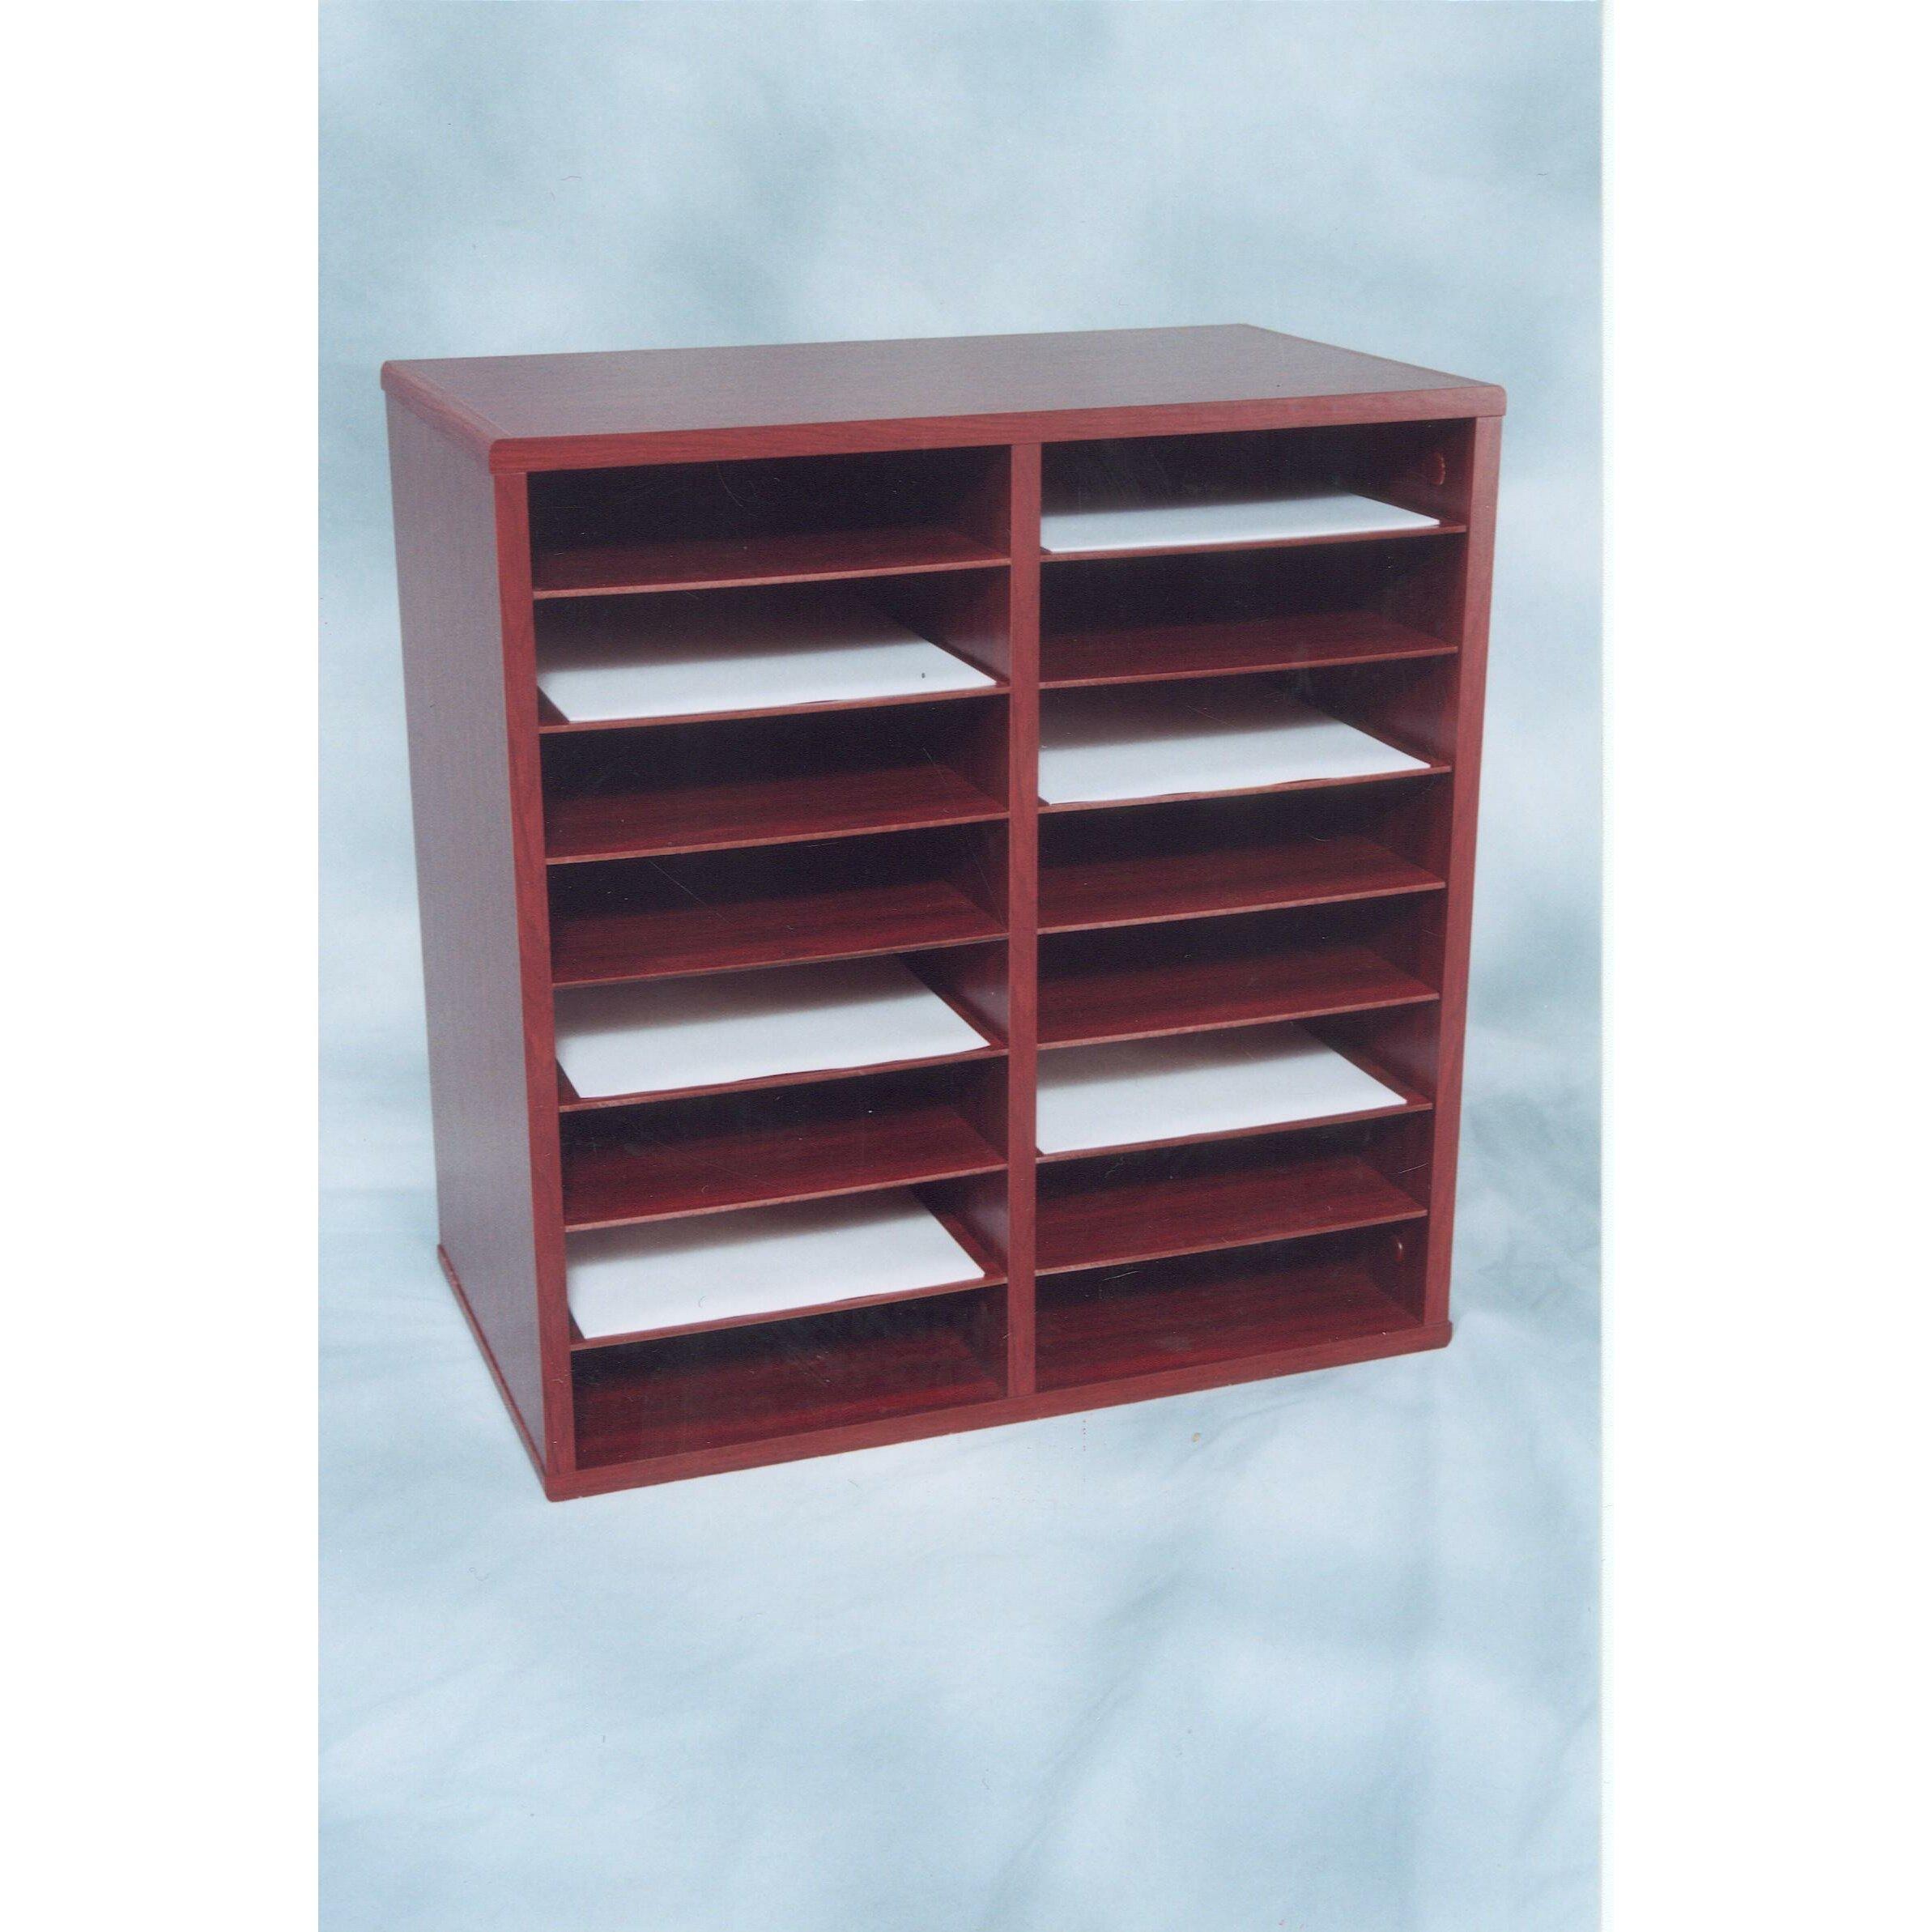 16 compartment laminate literature organizer wayfair for Abanos furniture industries decoration llc